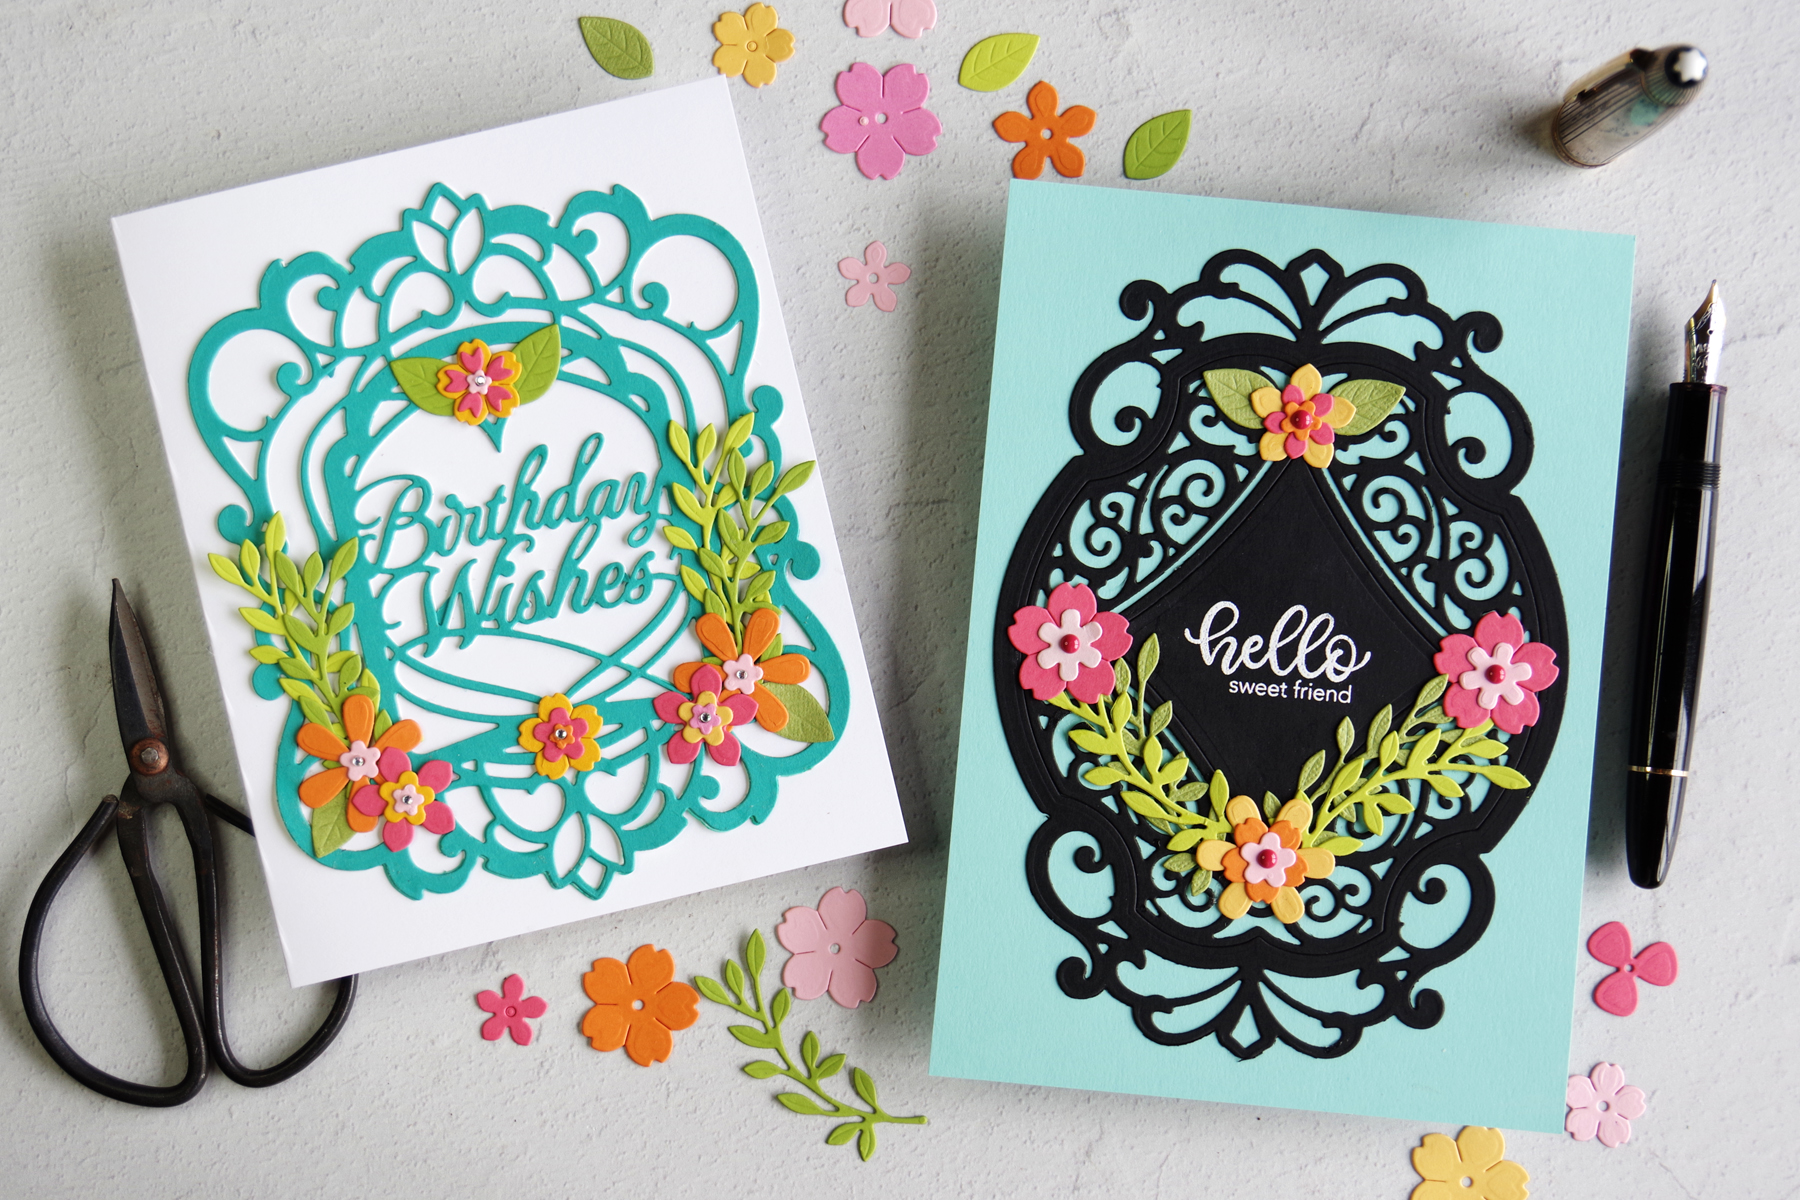 Spellbinders Amazing Paper Grace Beautiful Sentiment Vignettes Die Cut Cards